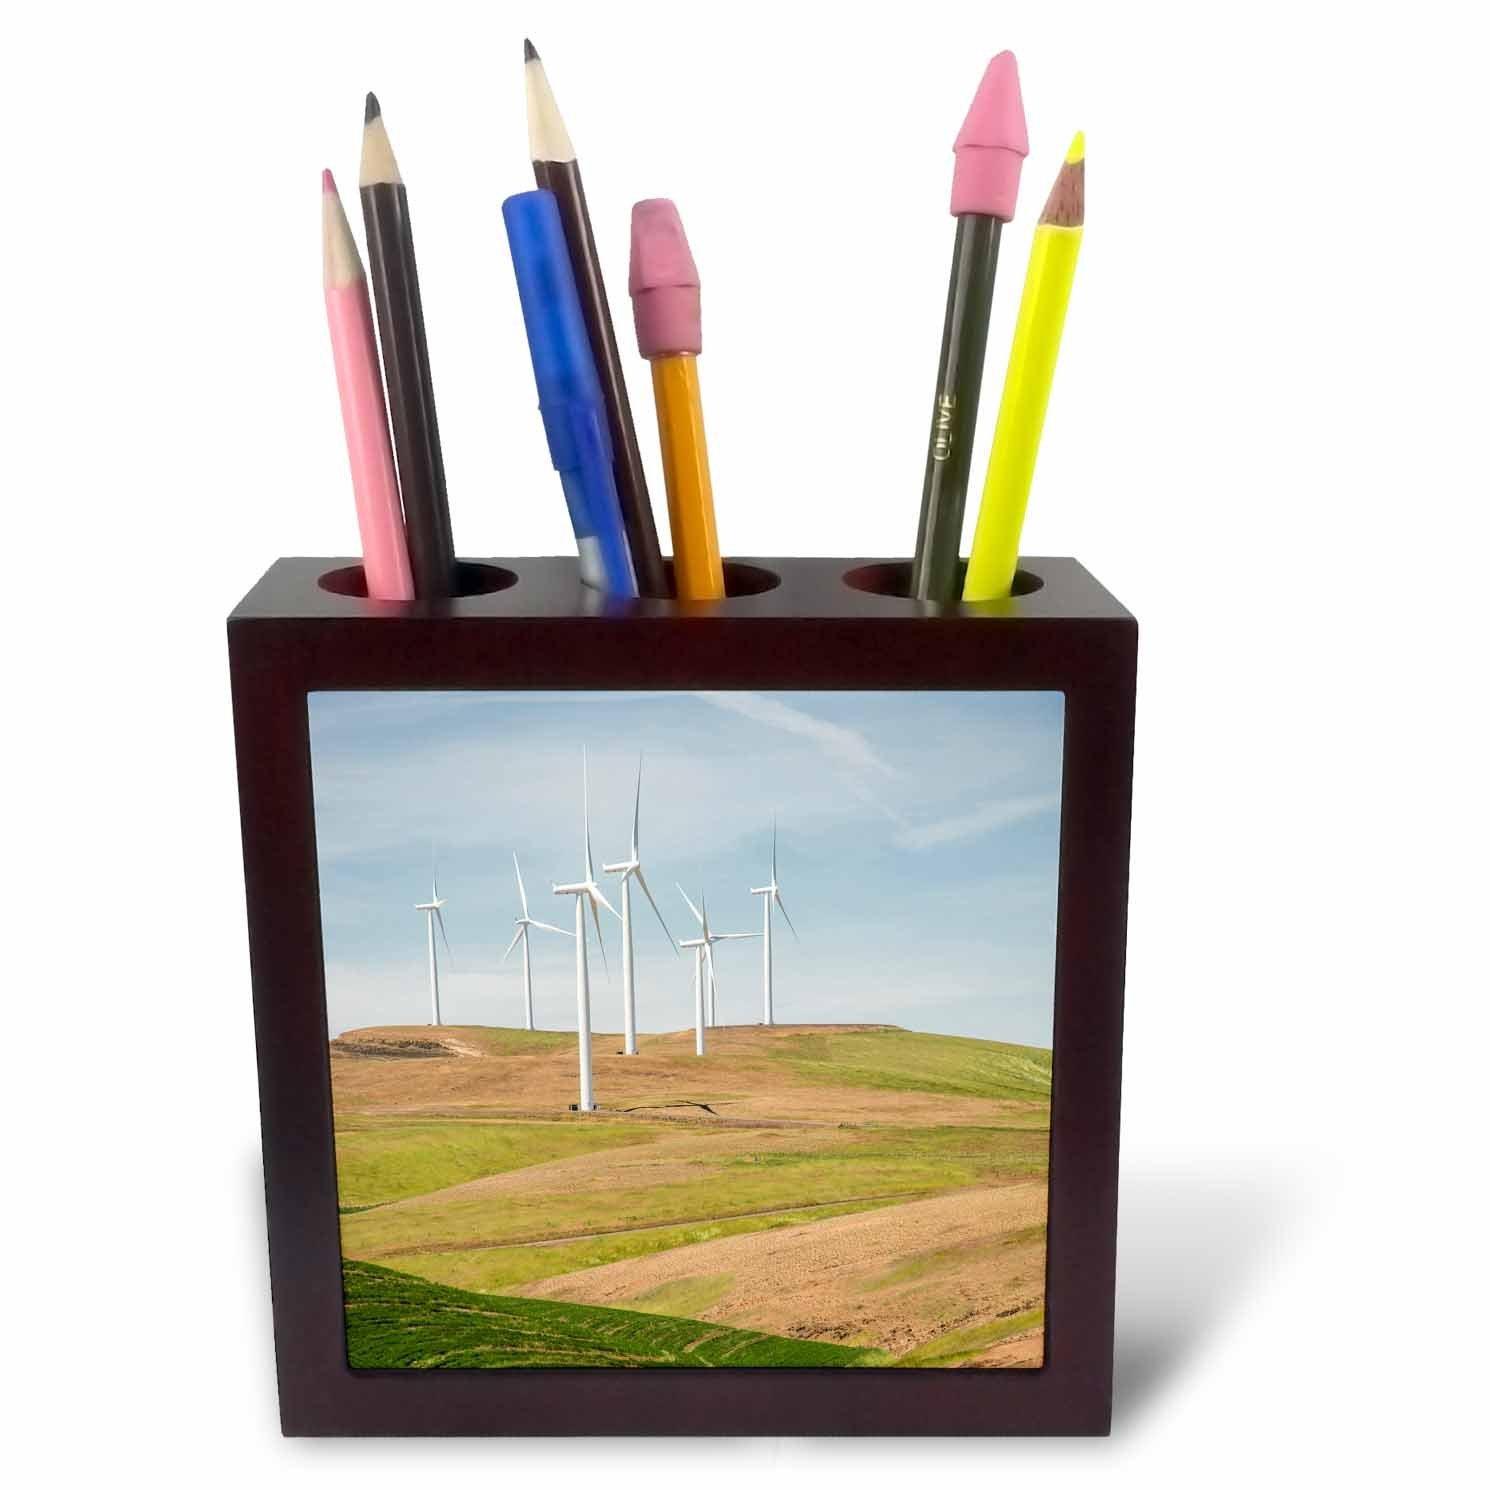 3dRose Danita Delimont - Palouse - Washington State, Palouse, wind turbines near Dodge Junction. - 5 inch tile pen holder (ph_251501_1)